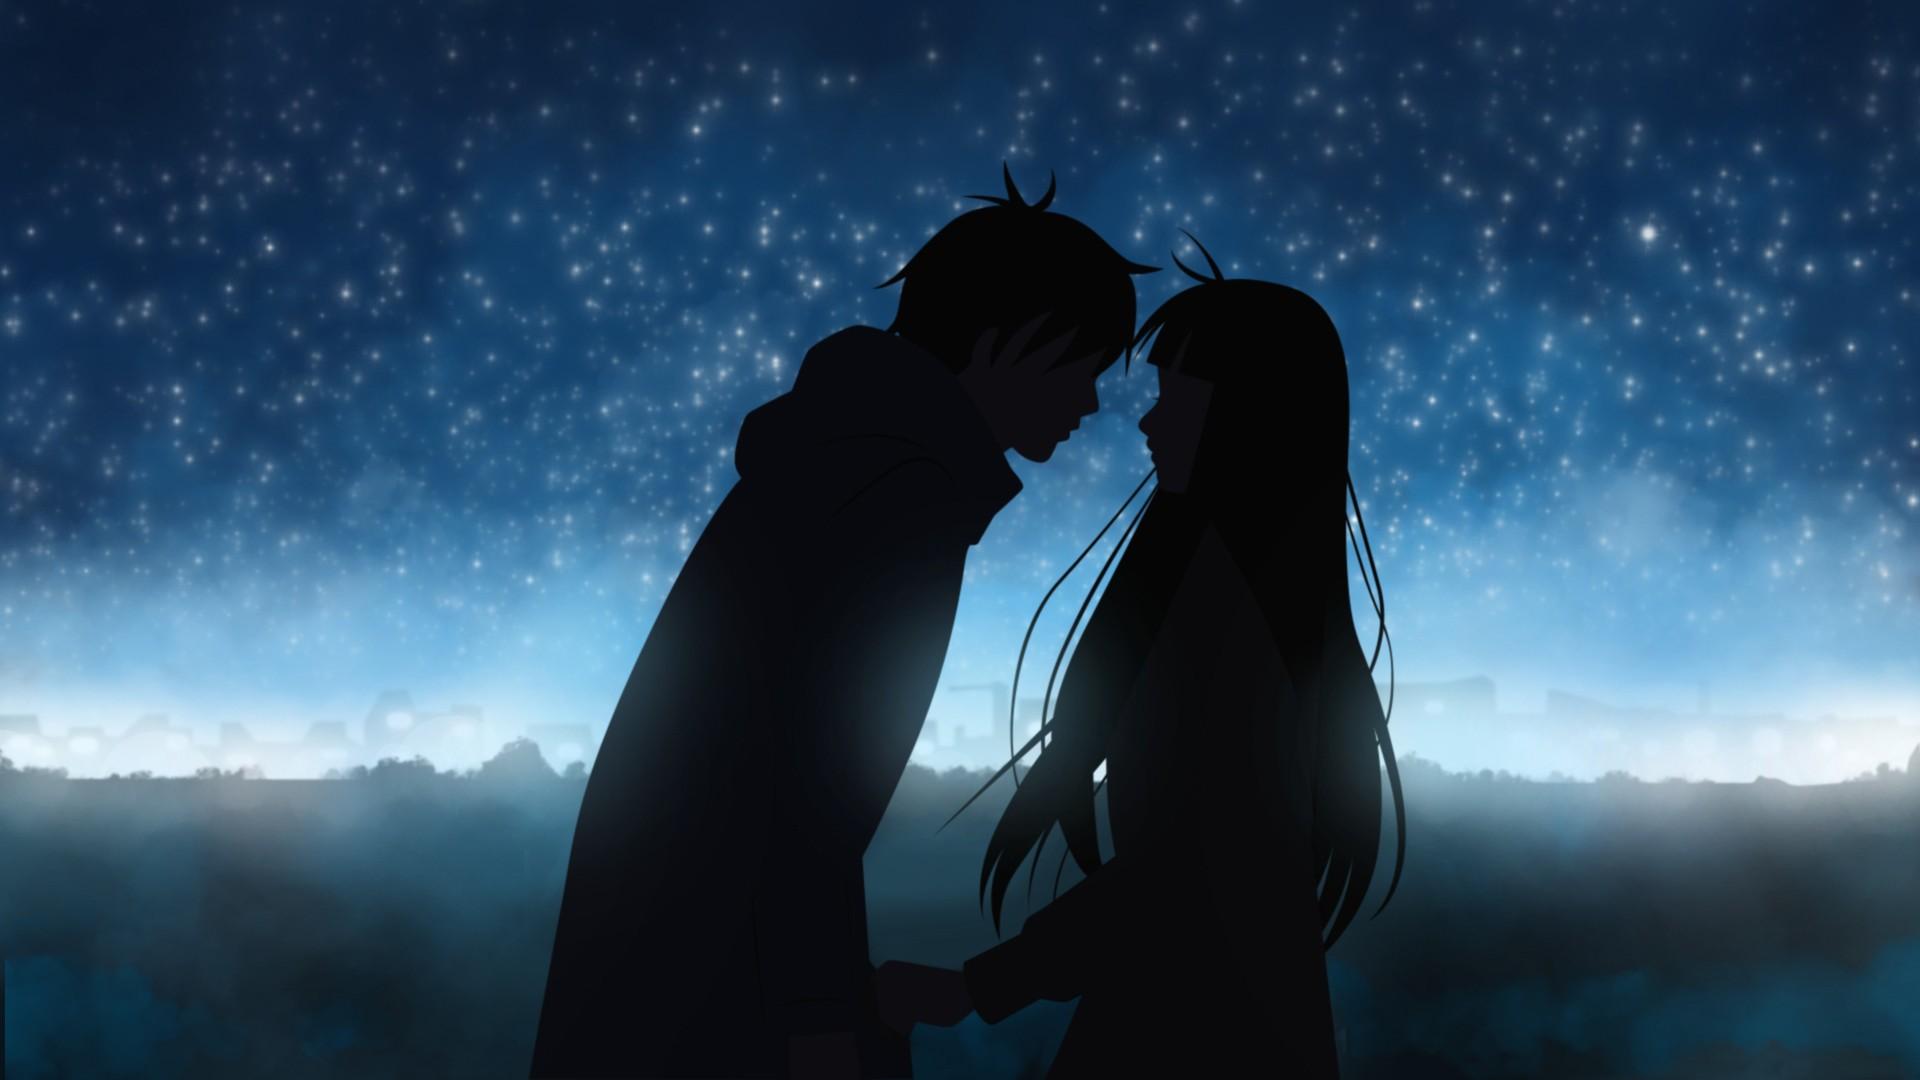 Romantic Anime Wallpaper Hd Desktop Wallpapers Cool Anime Couple